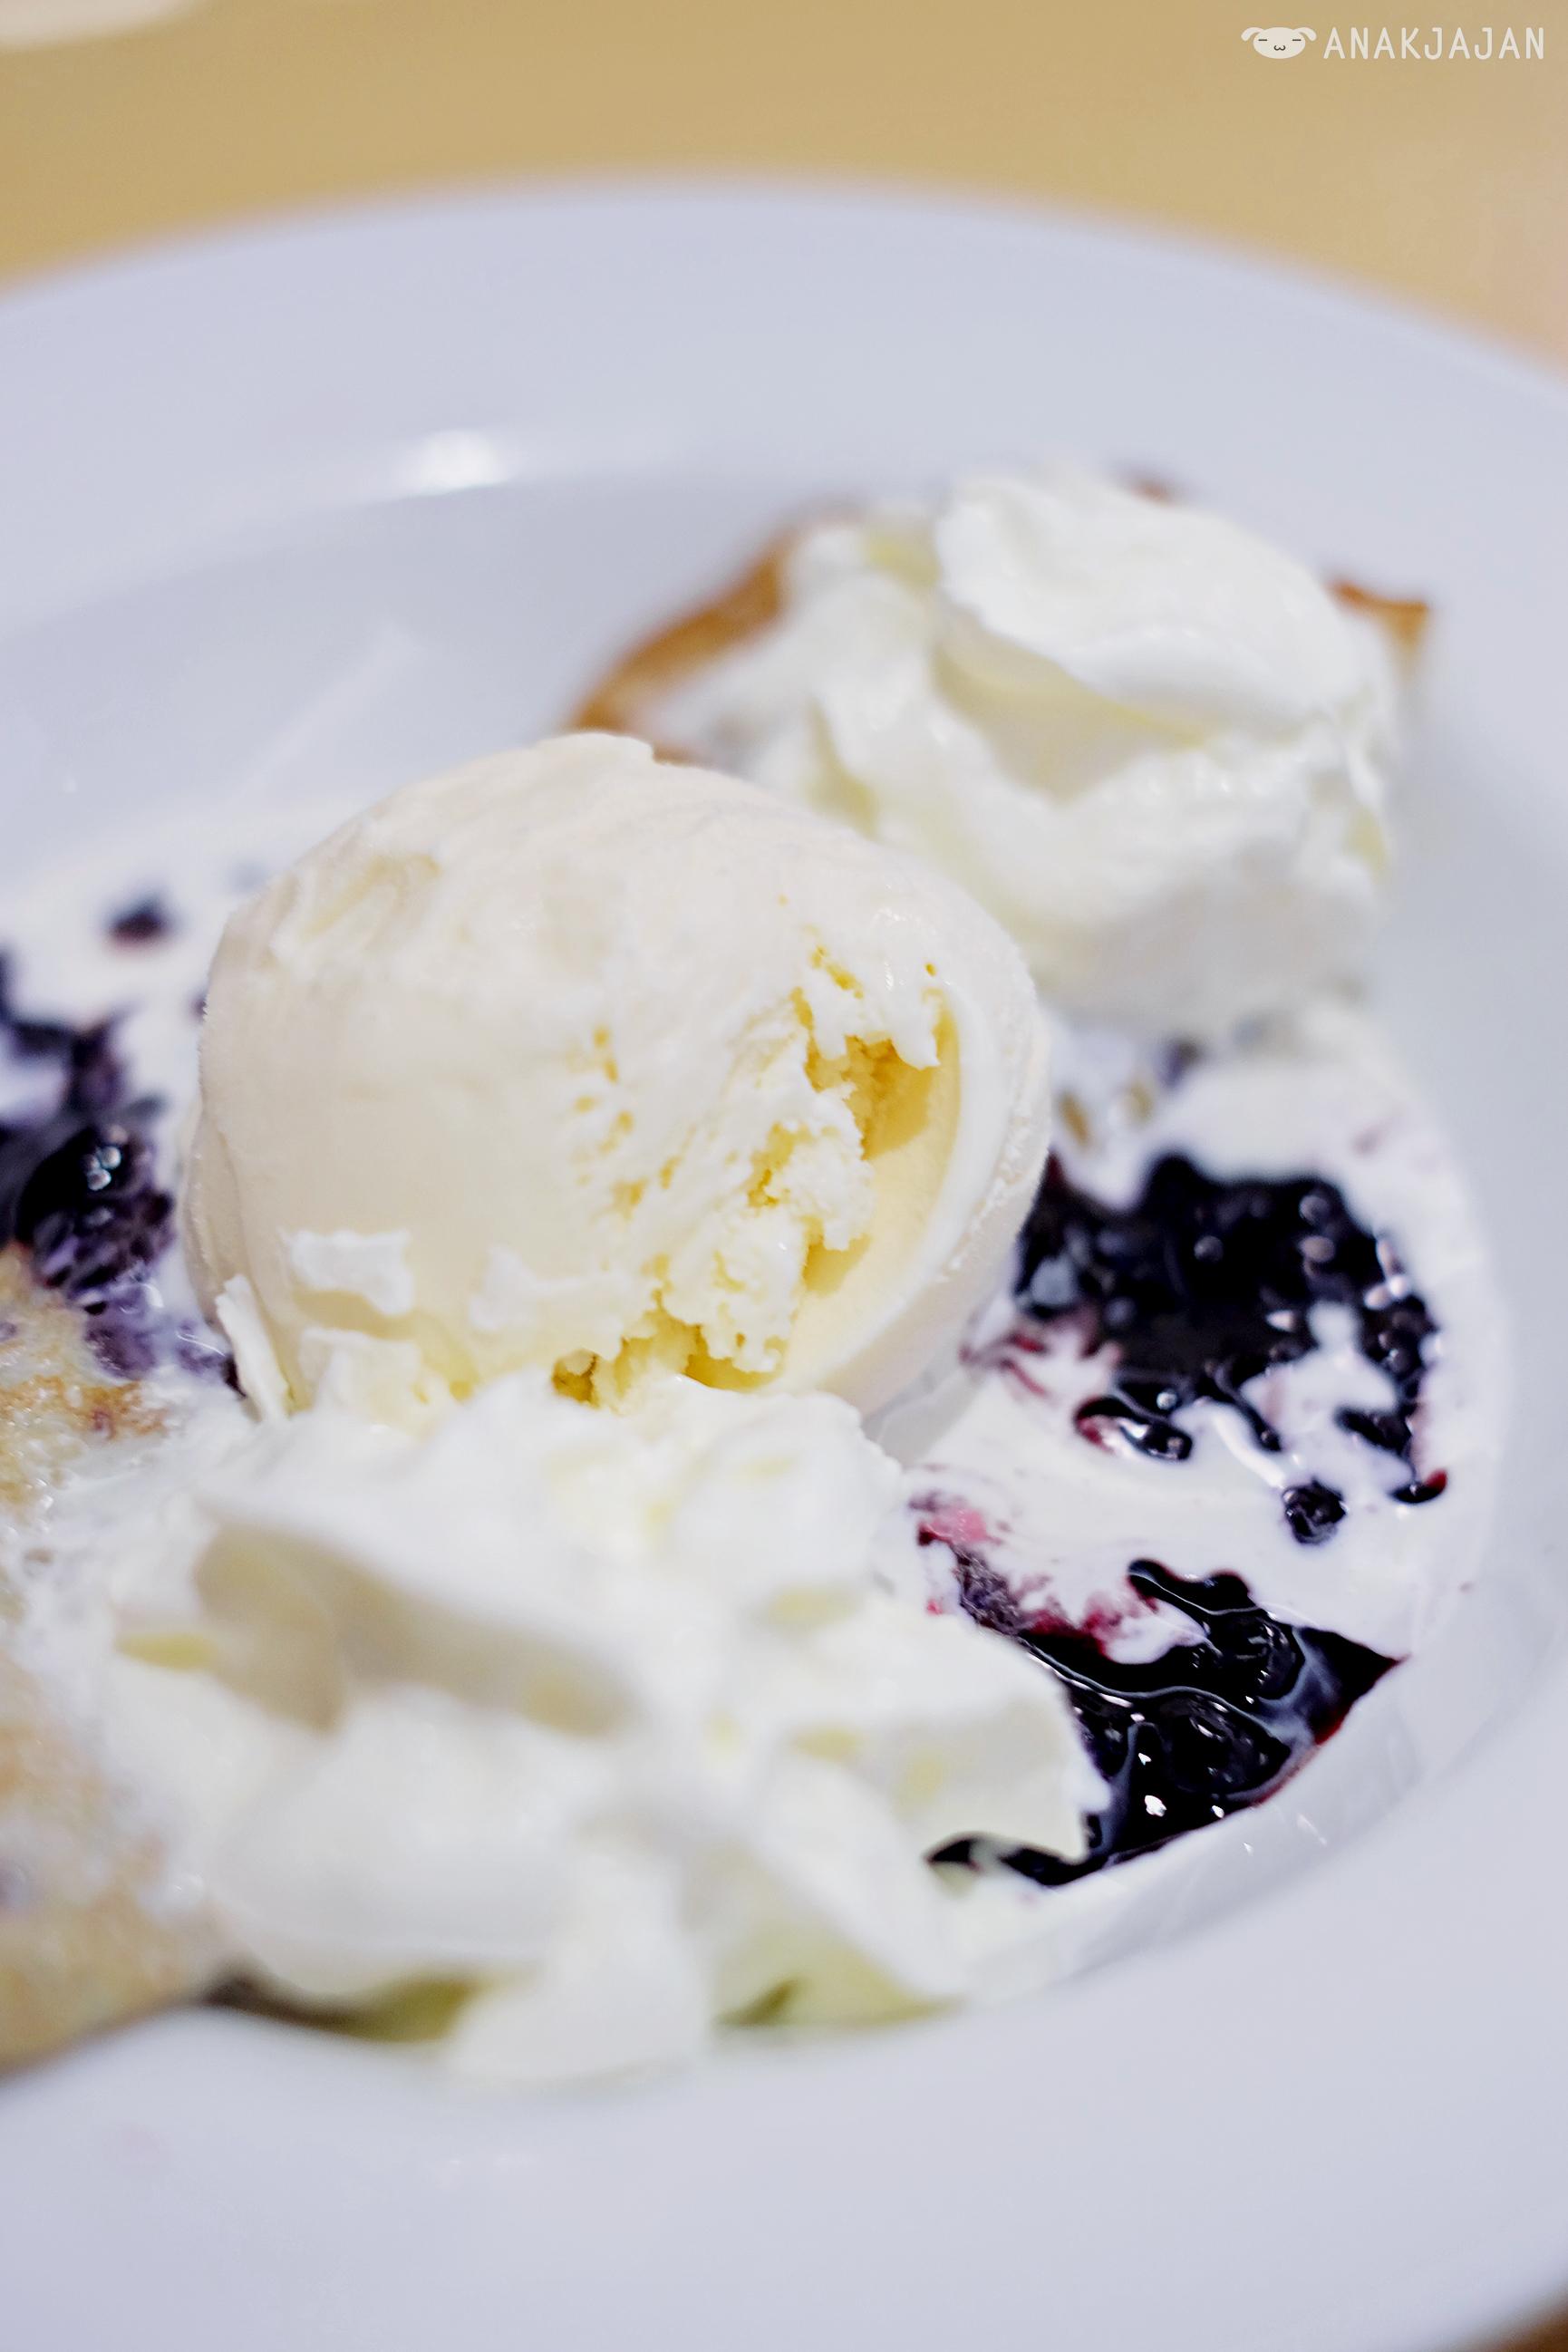 IHOP – All Day Dining Restaurant, Dubai   ANAKJAJAN.COM